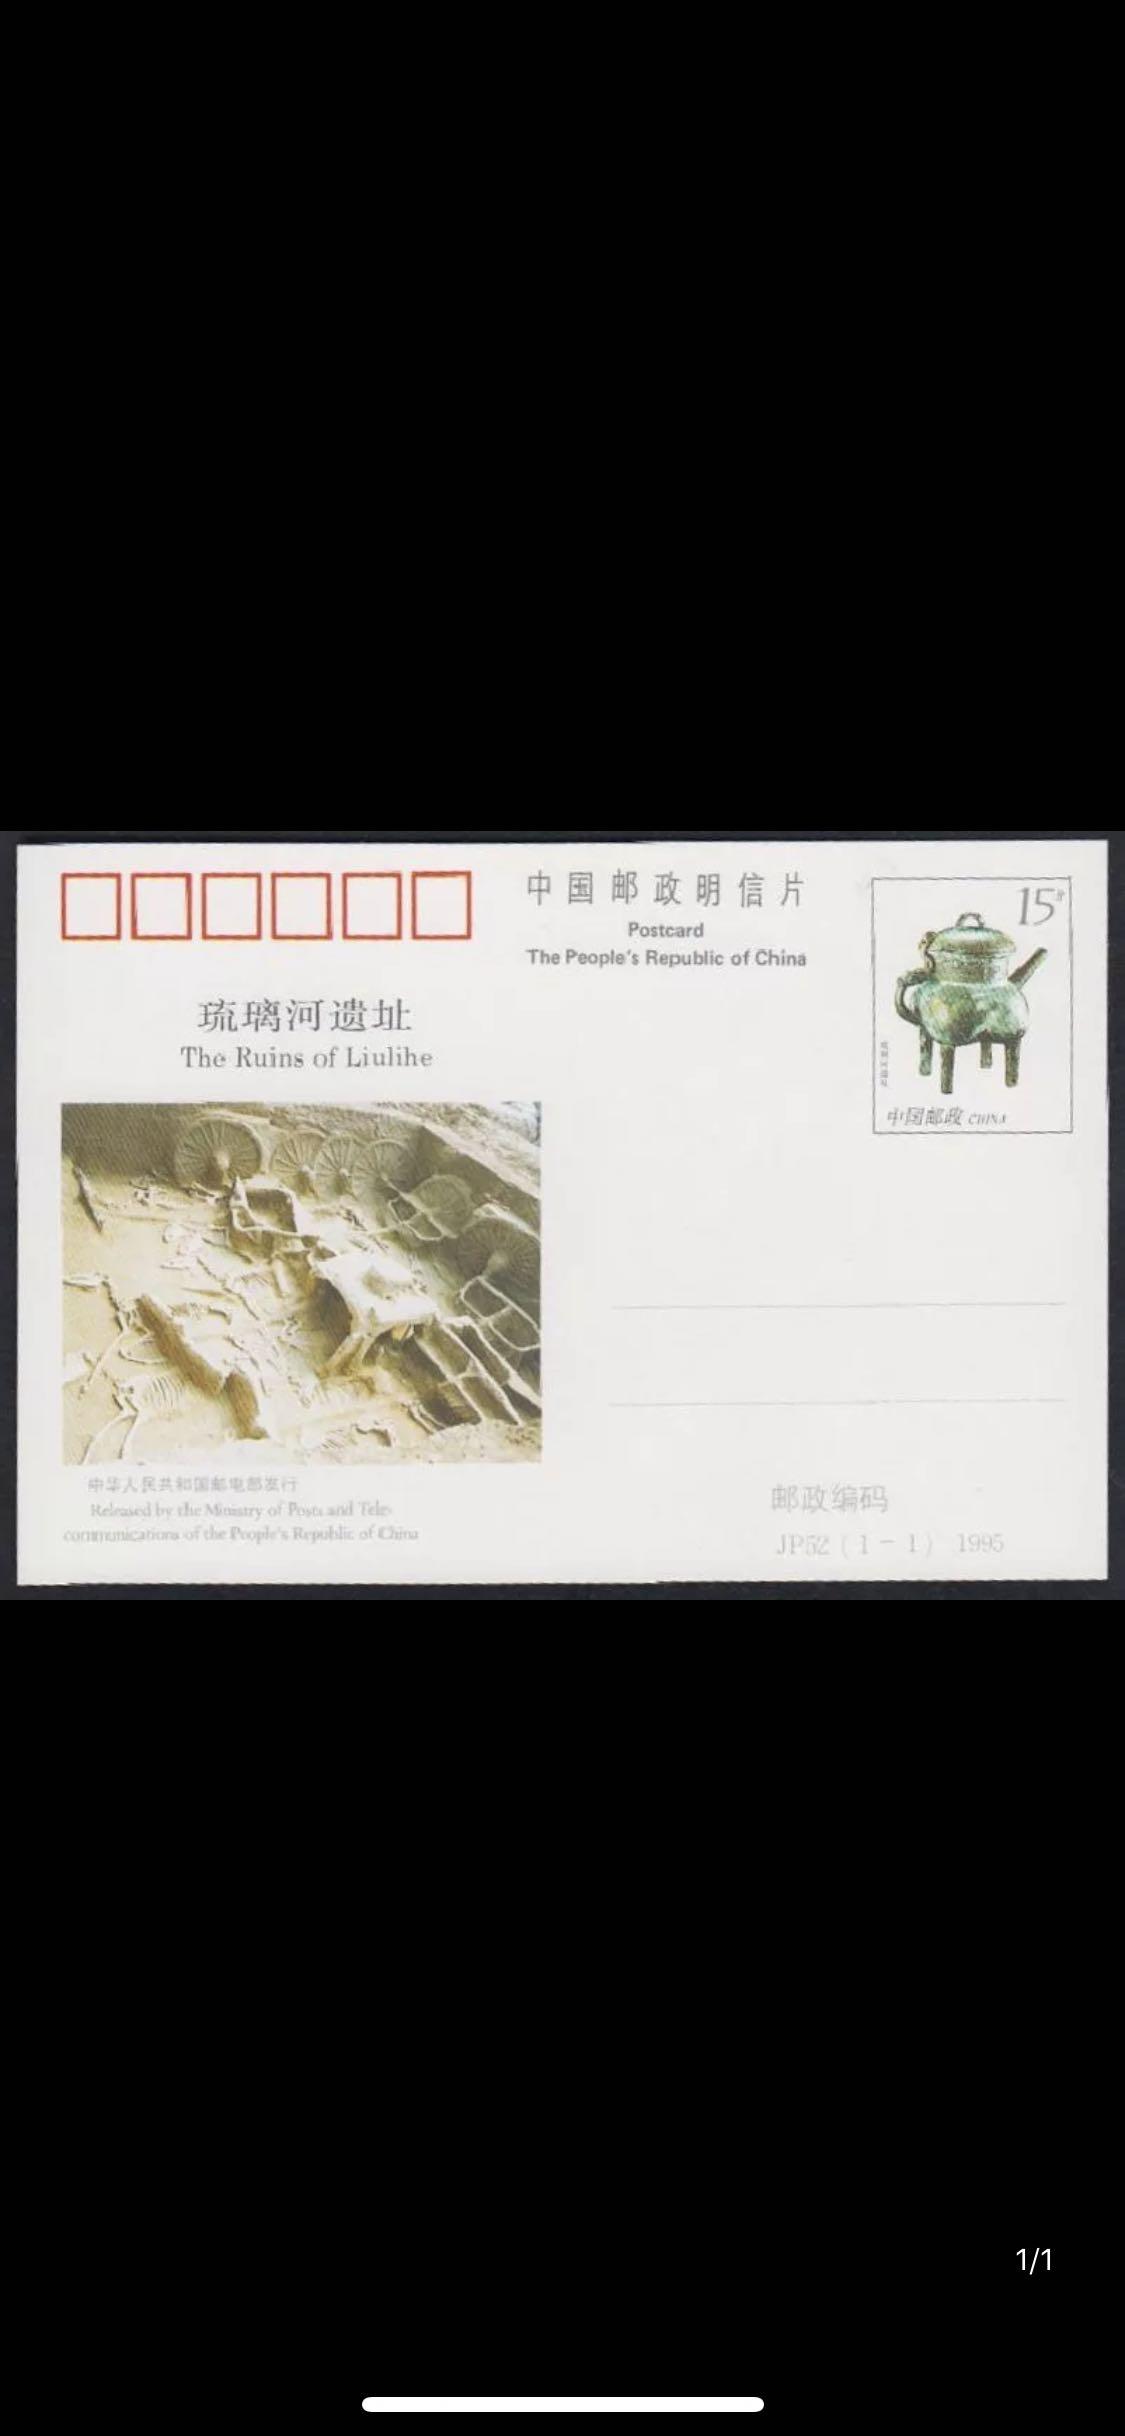 JP52 琉璃河遗址 纪念邮资明信片  邮局正品 Изображение 1